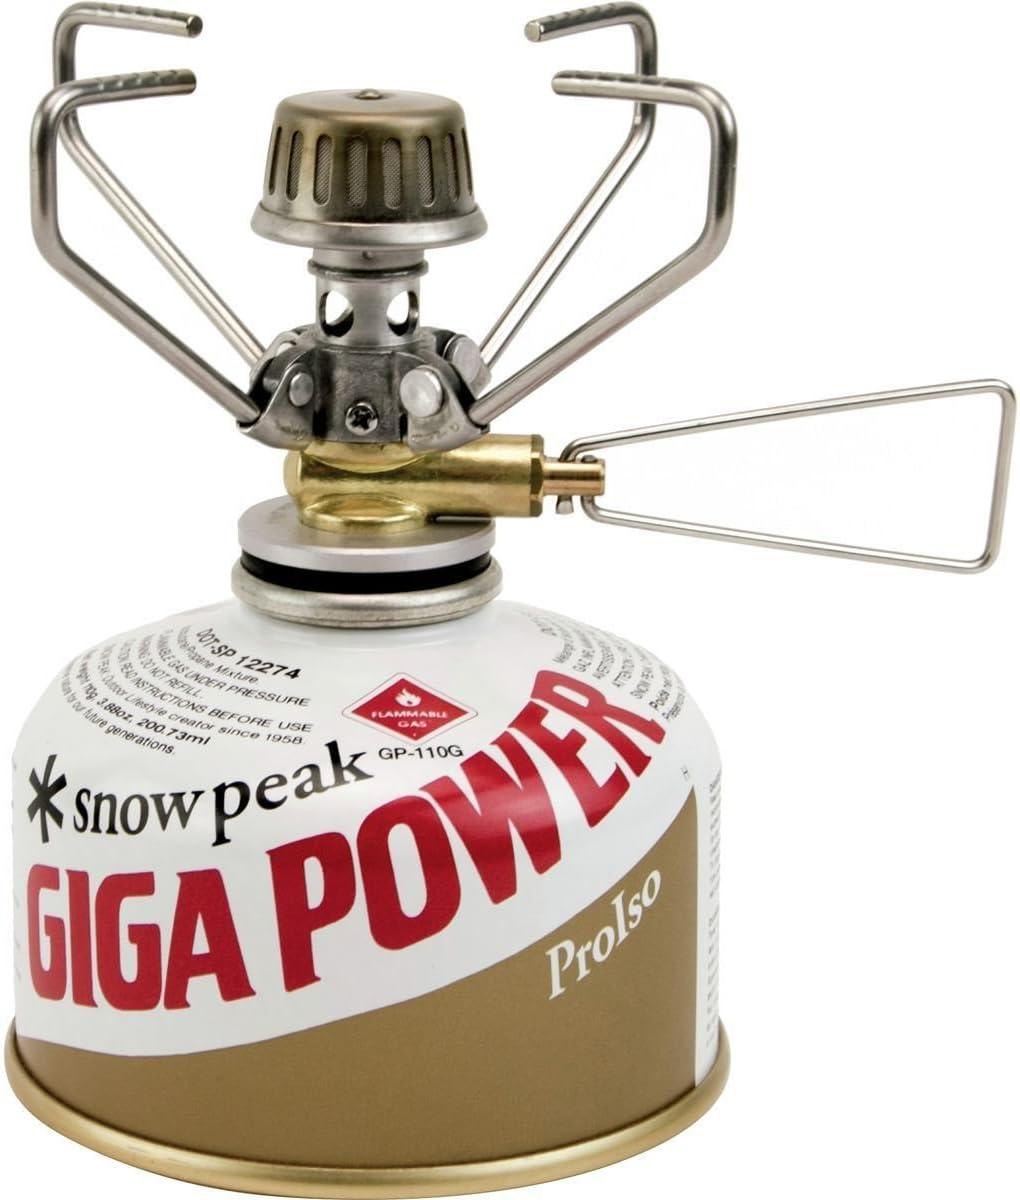 Snow Peak Giga Power Stove